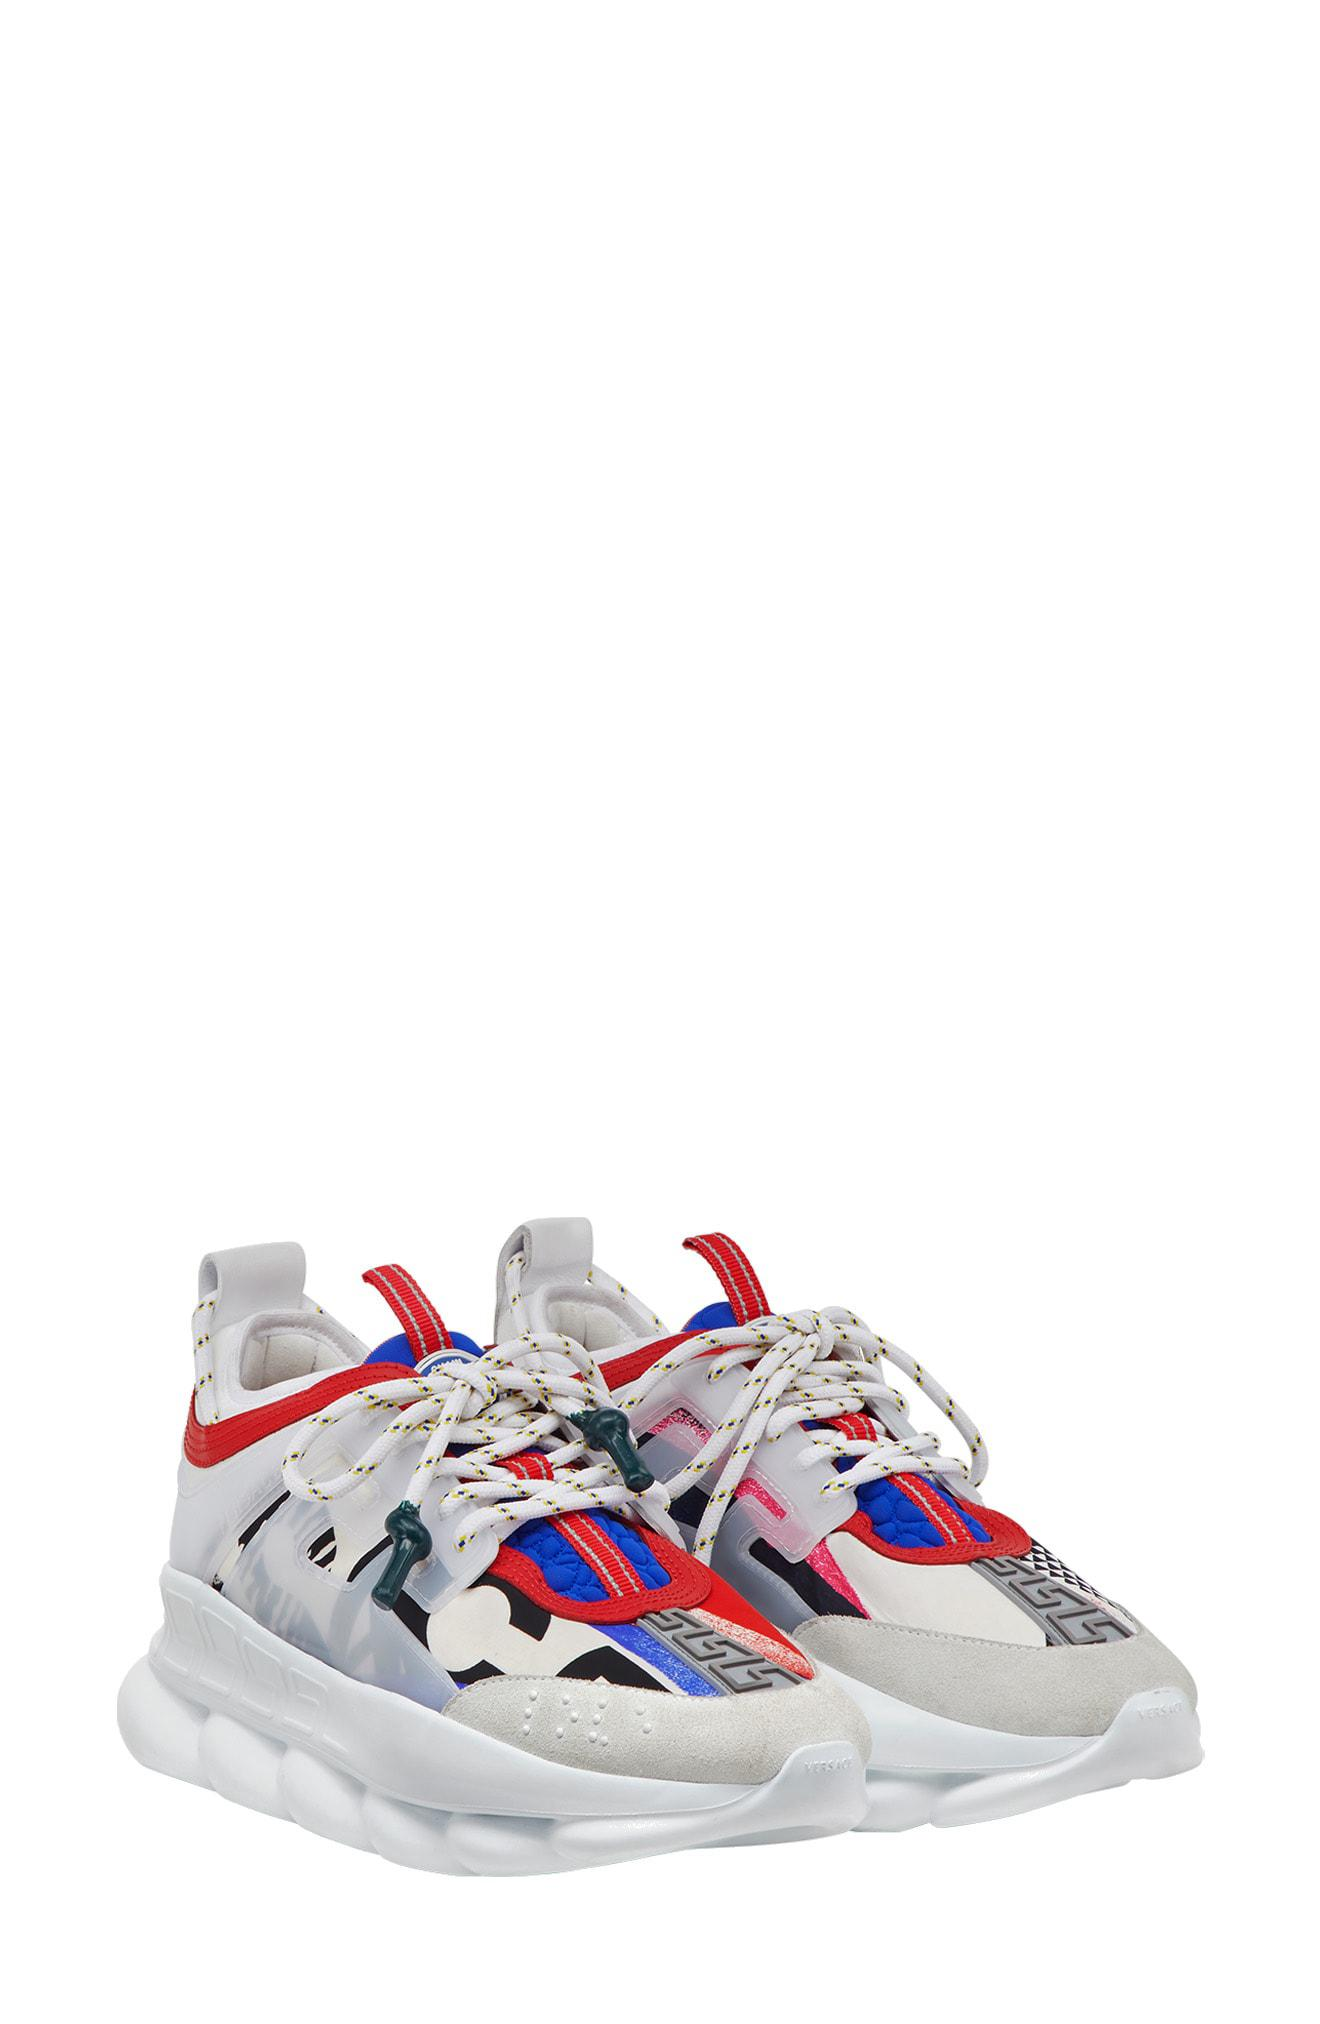 Versace Chain Reaction Sneaker - Lyst